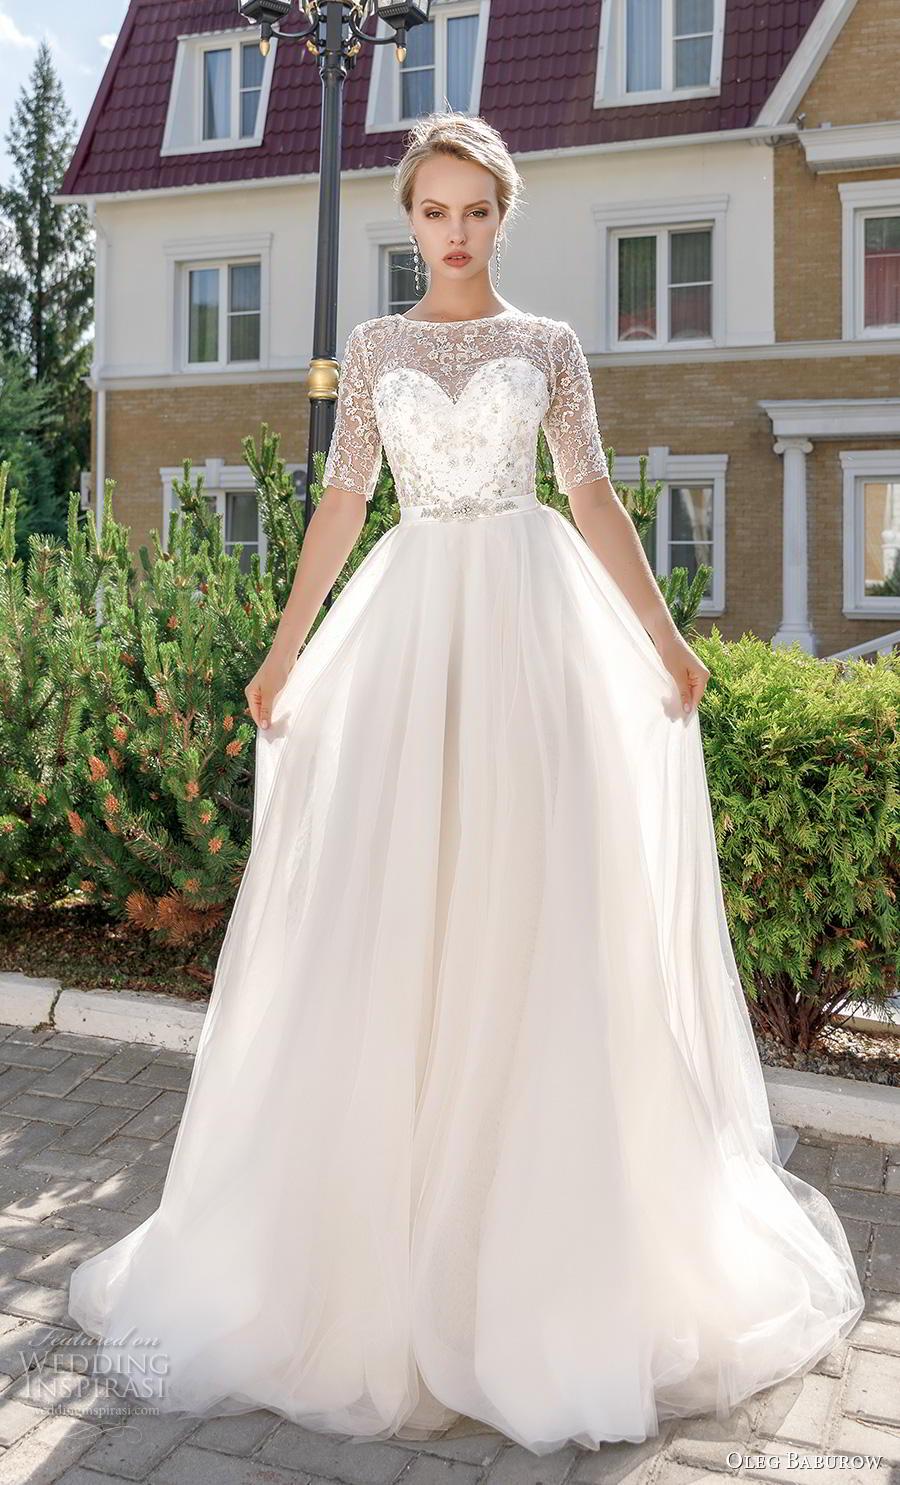 oleg baburow 2020 bridal half sleeves illusion jewel sweetheart neckline heavily embellished bodice romantic soft a  line wedding dress keyhole corset back chapel train (7) mv